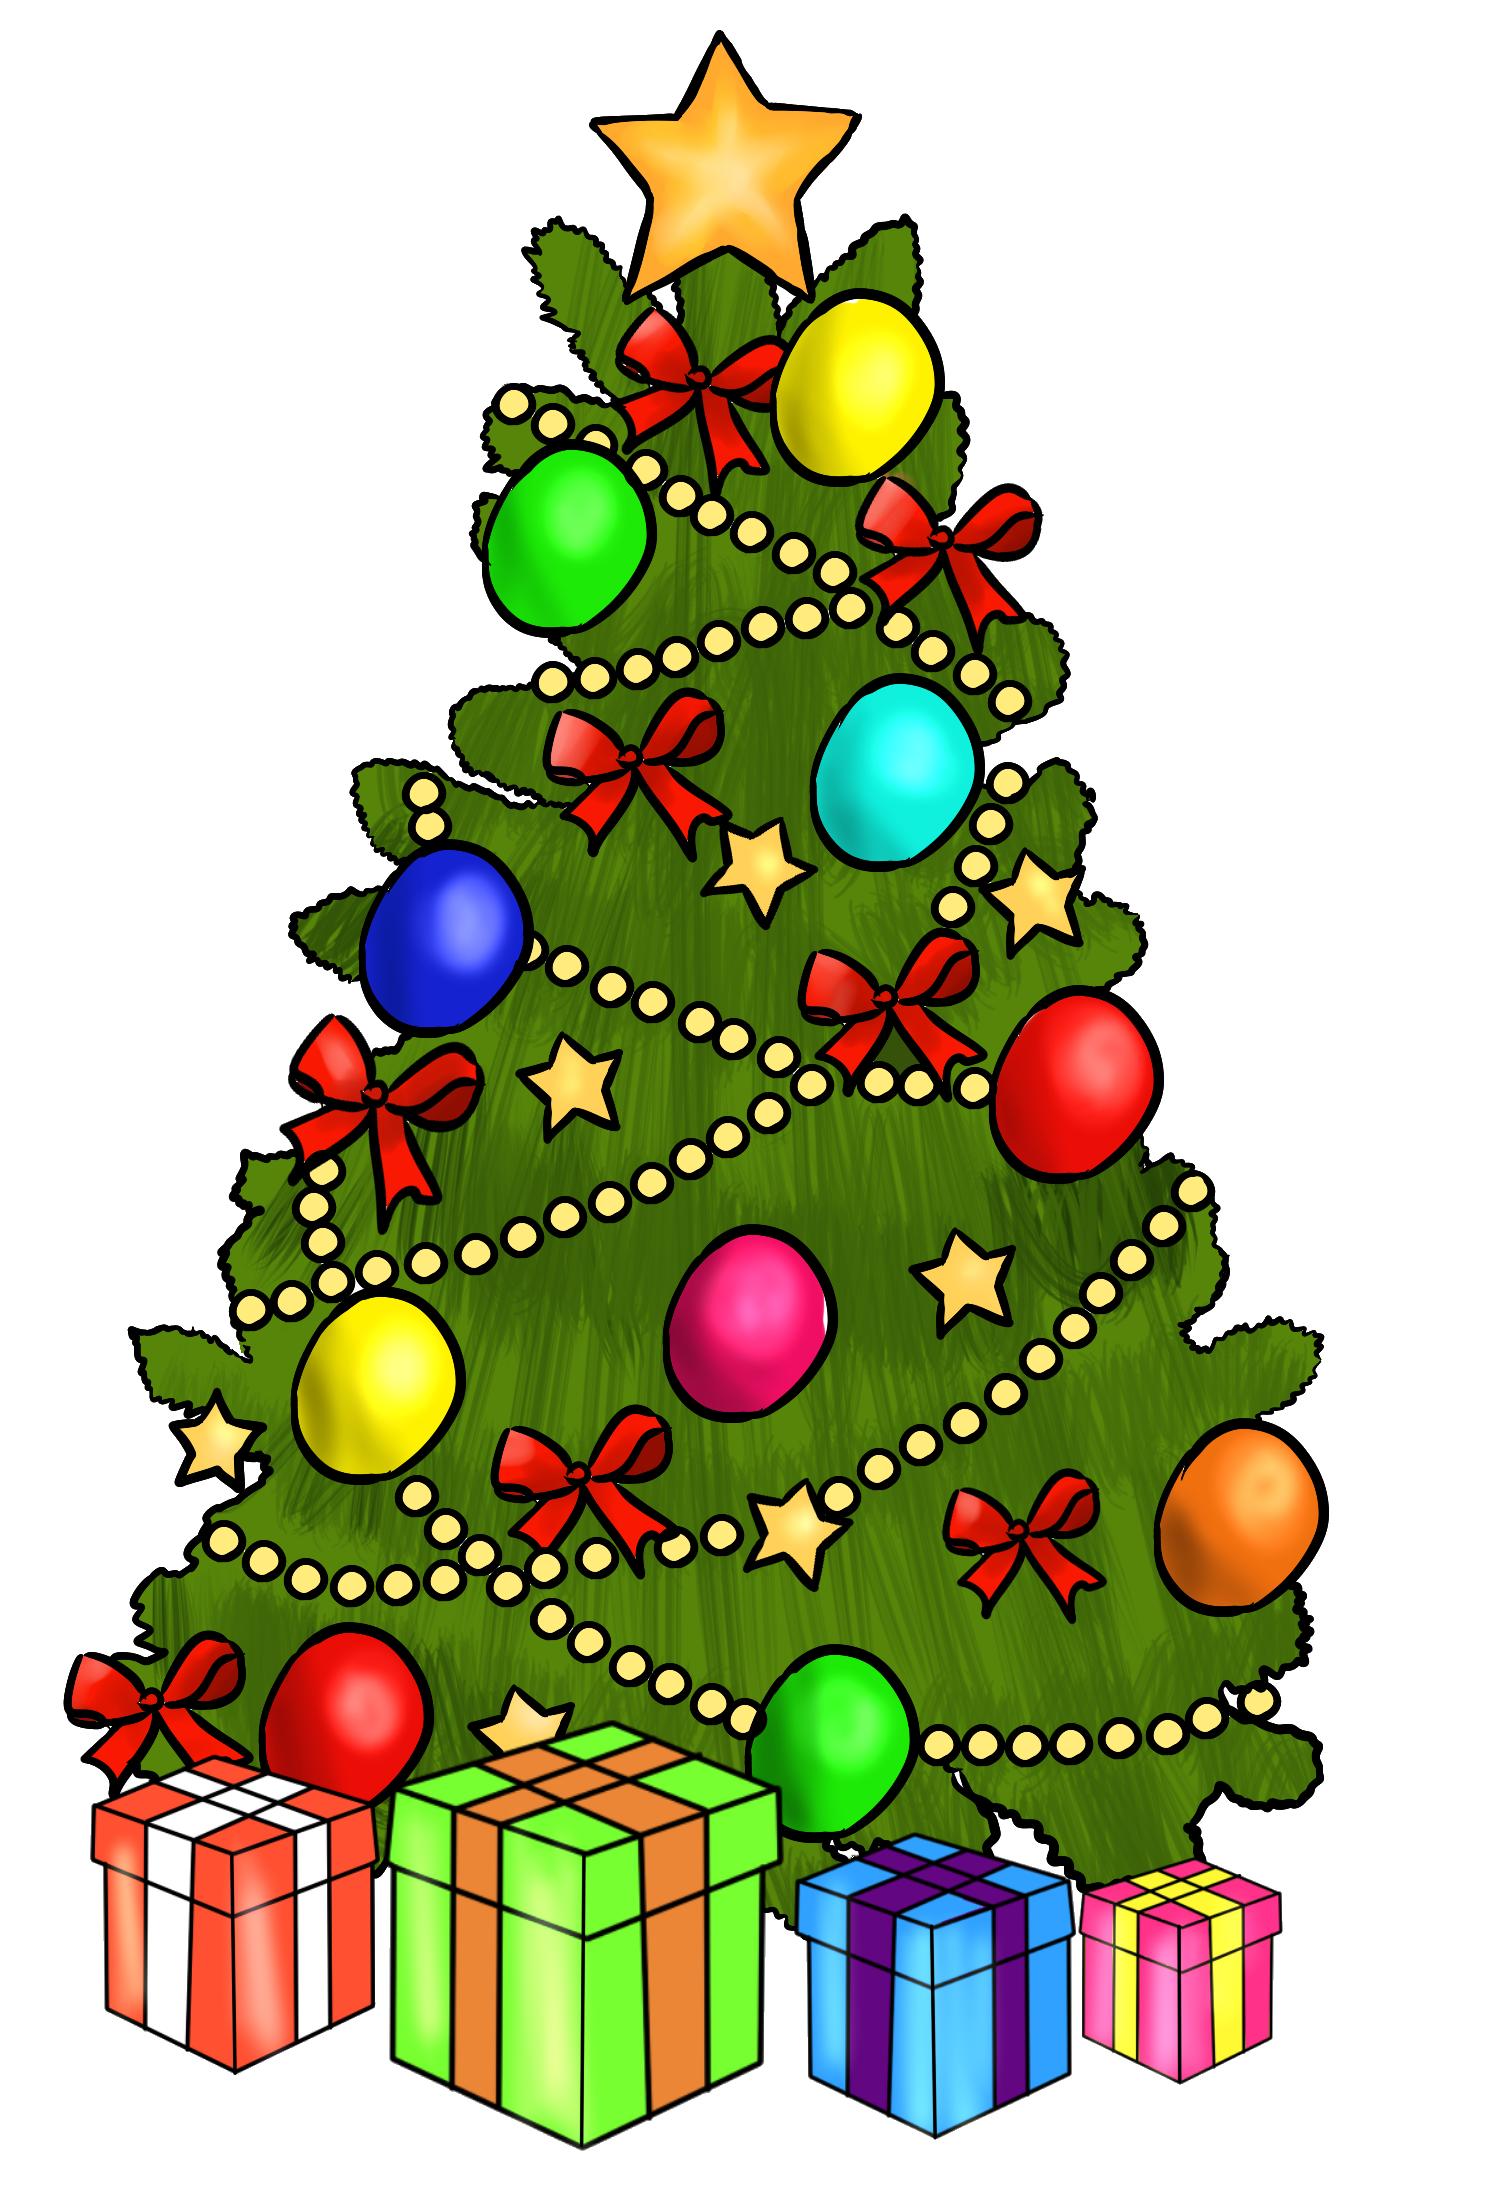 Christmas Tree Clip Art ..-Christmas Tree Clip Art ..-2